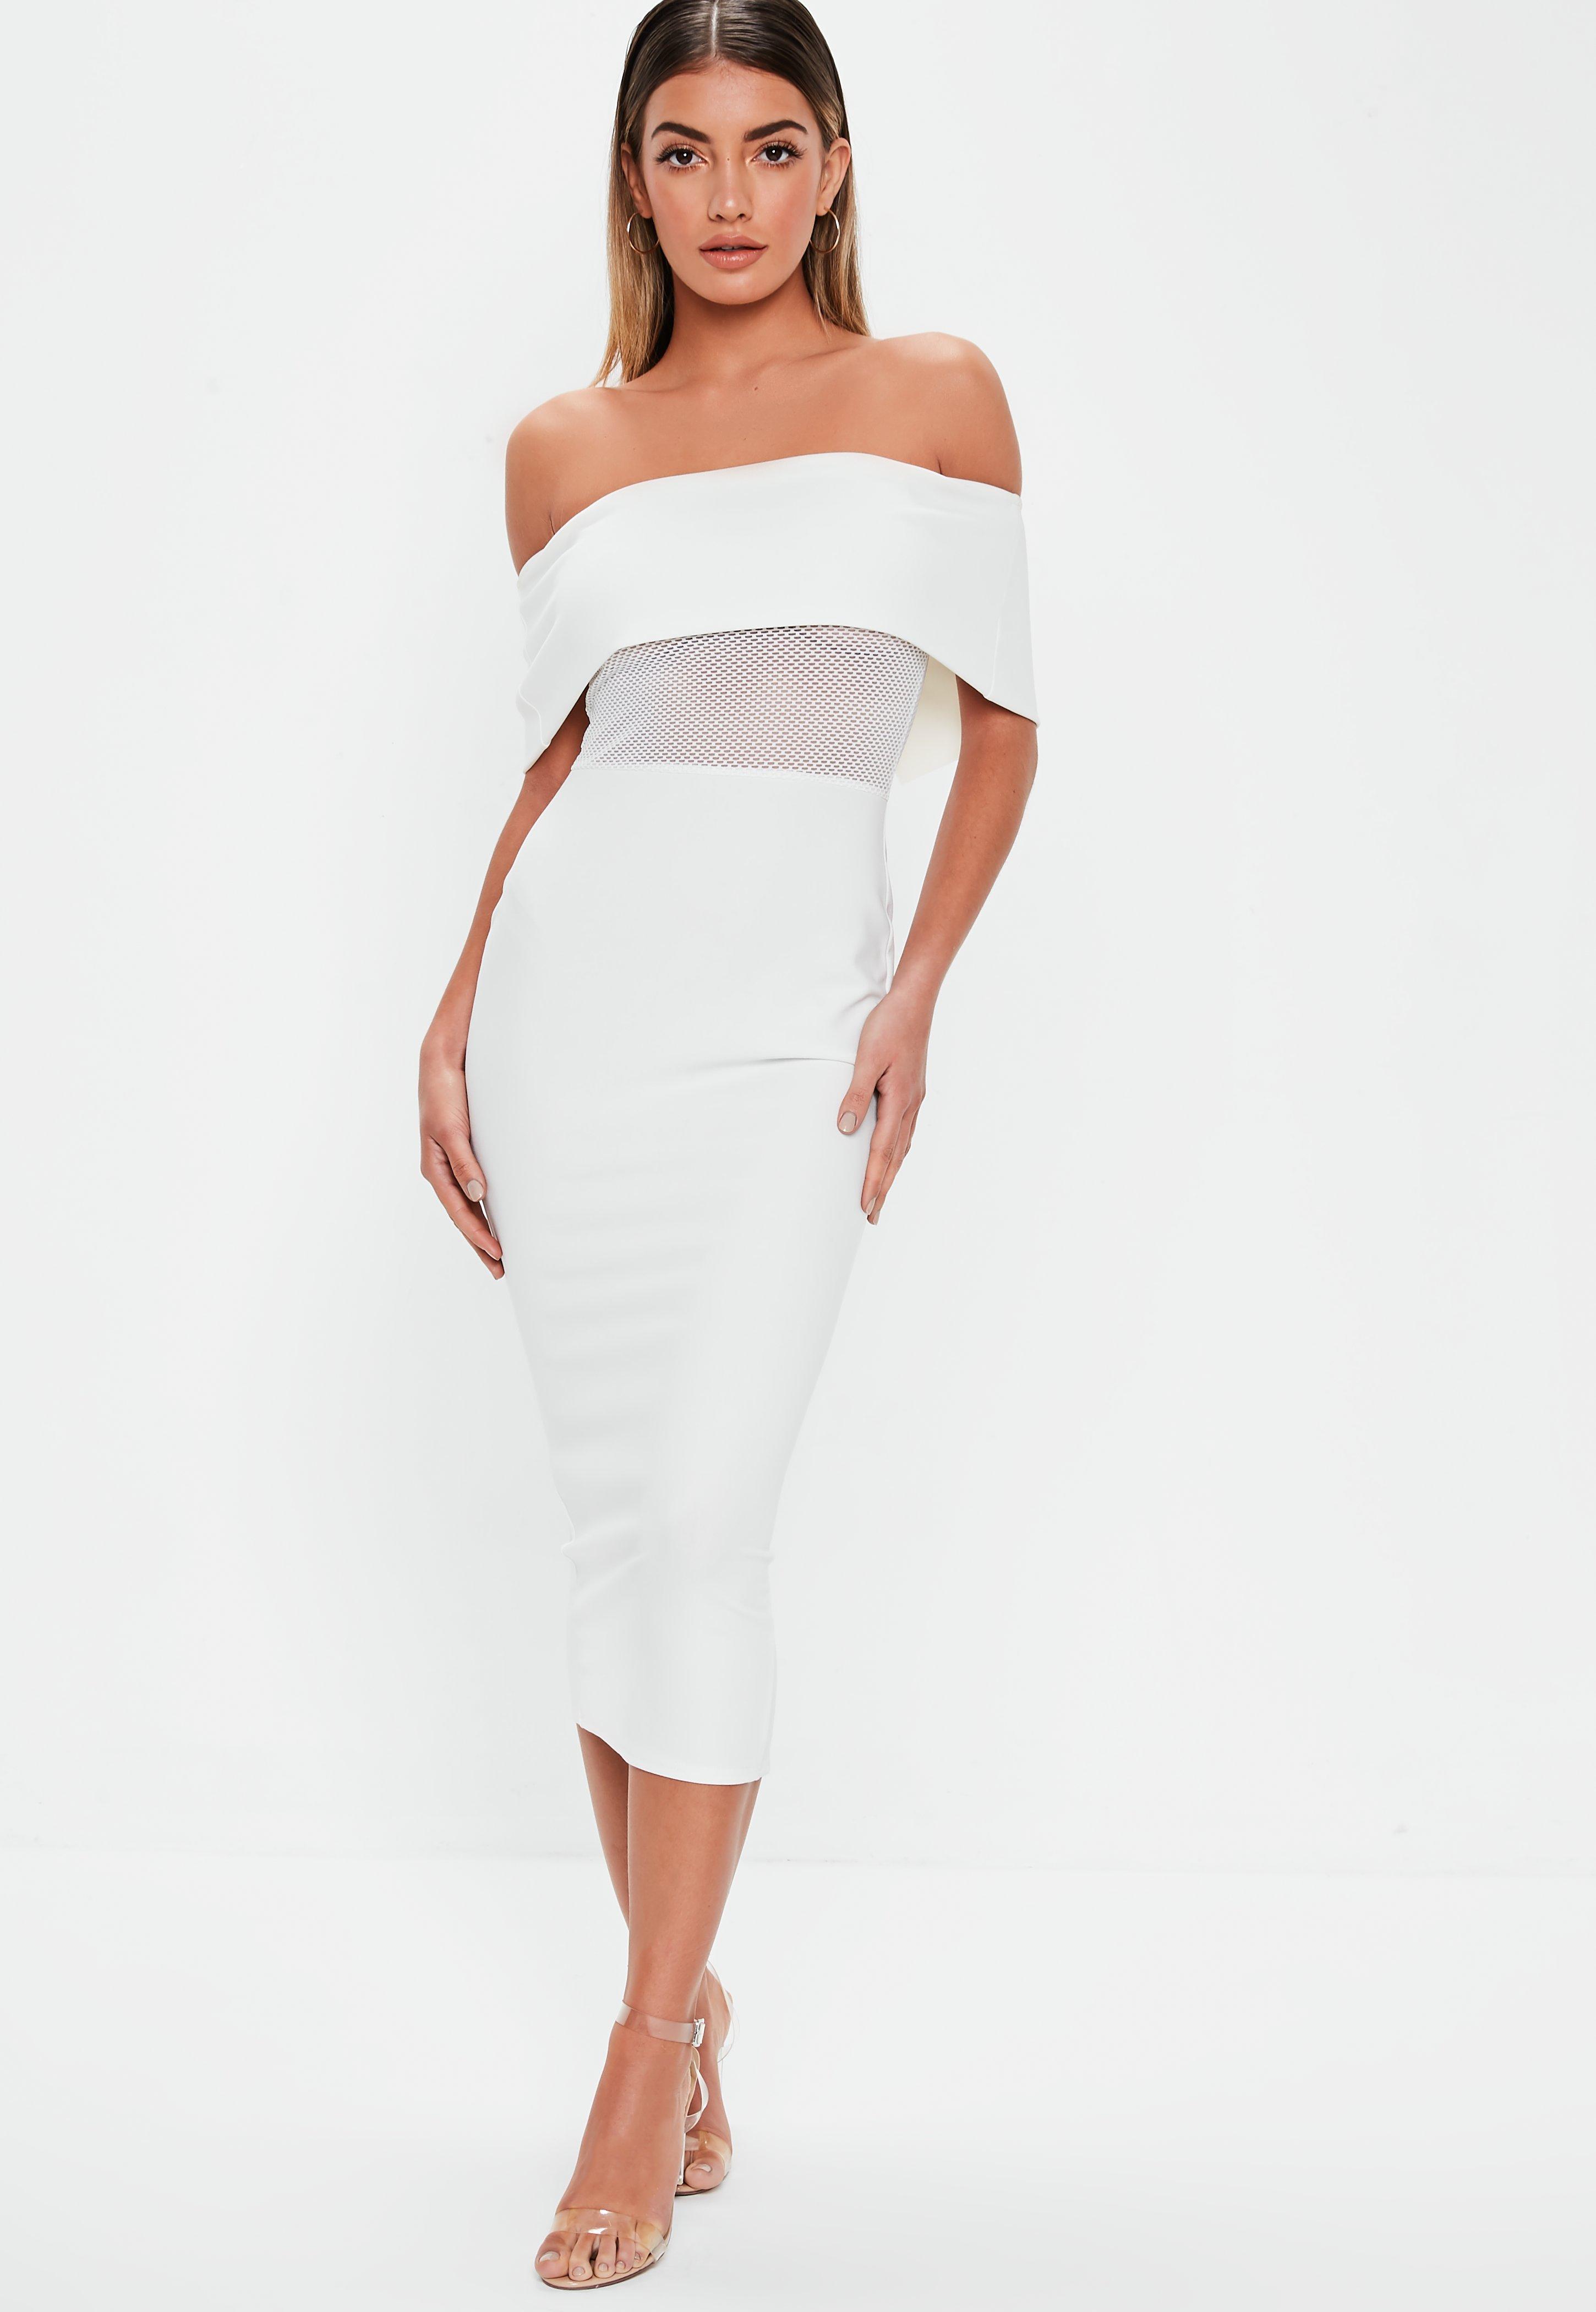 20ce49a2c9 Off the Shoulder Dresses - Bardot Dresses Online